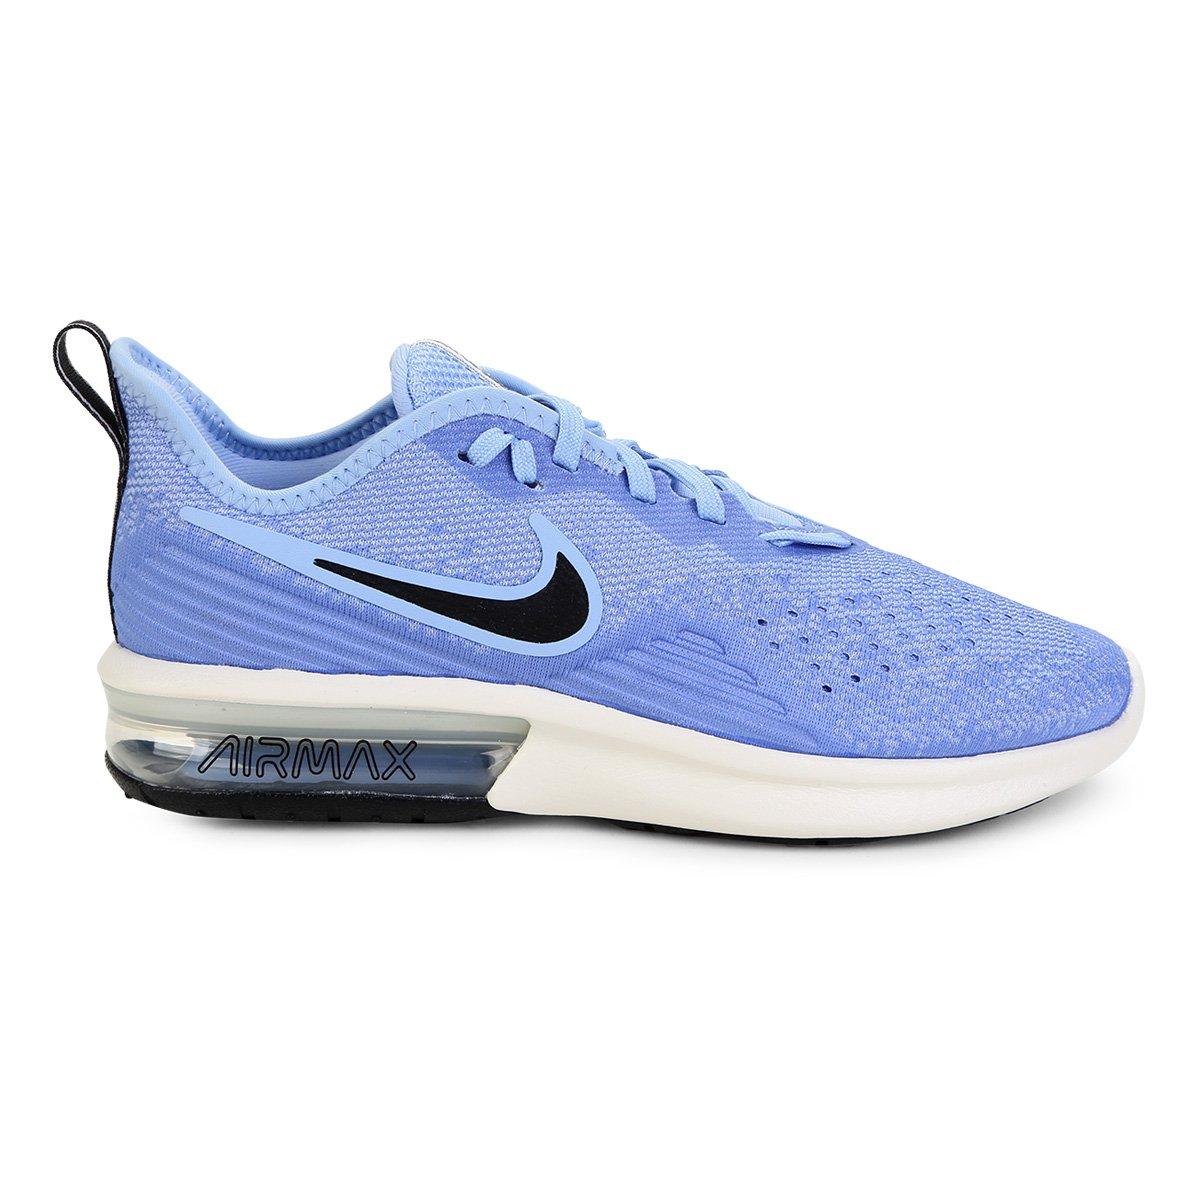 Tênis Nike Air Max Sequent 4 Feminino - Tam: 35 - 4